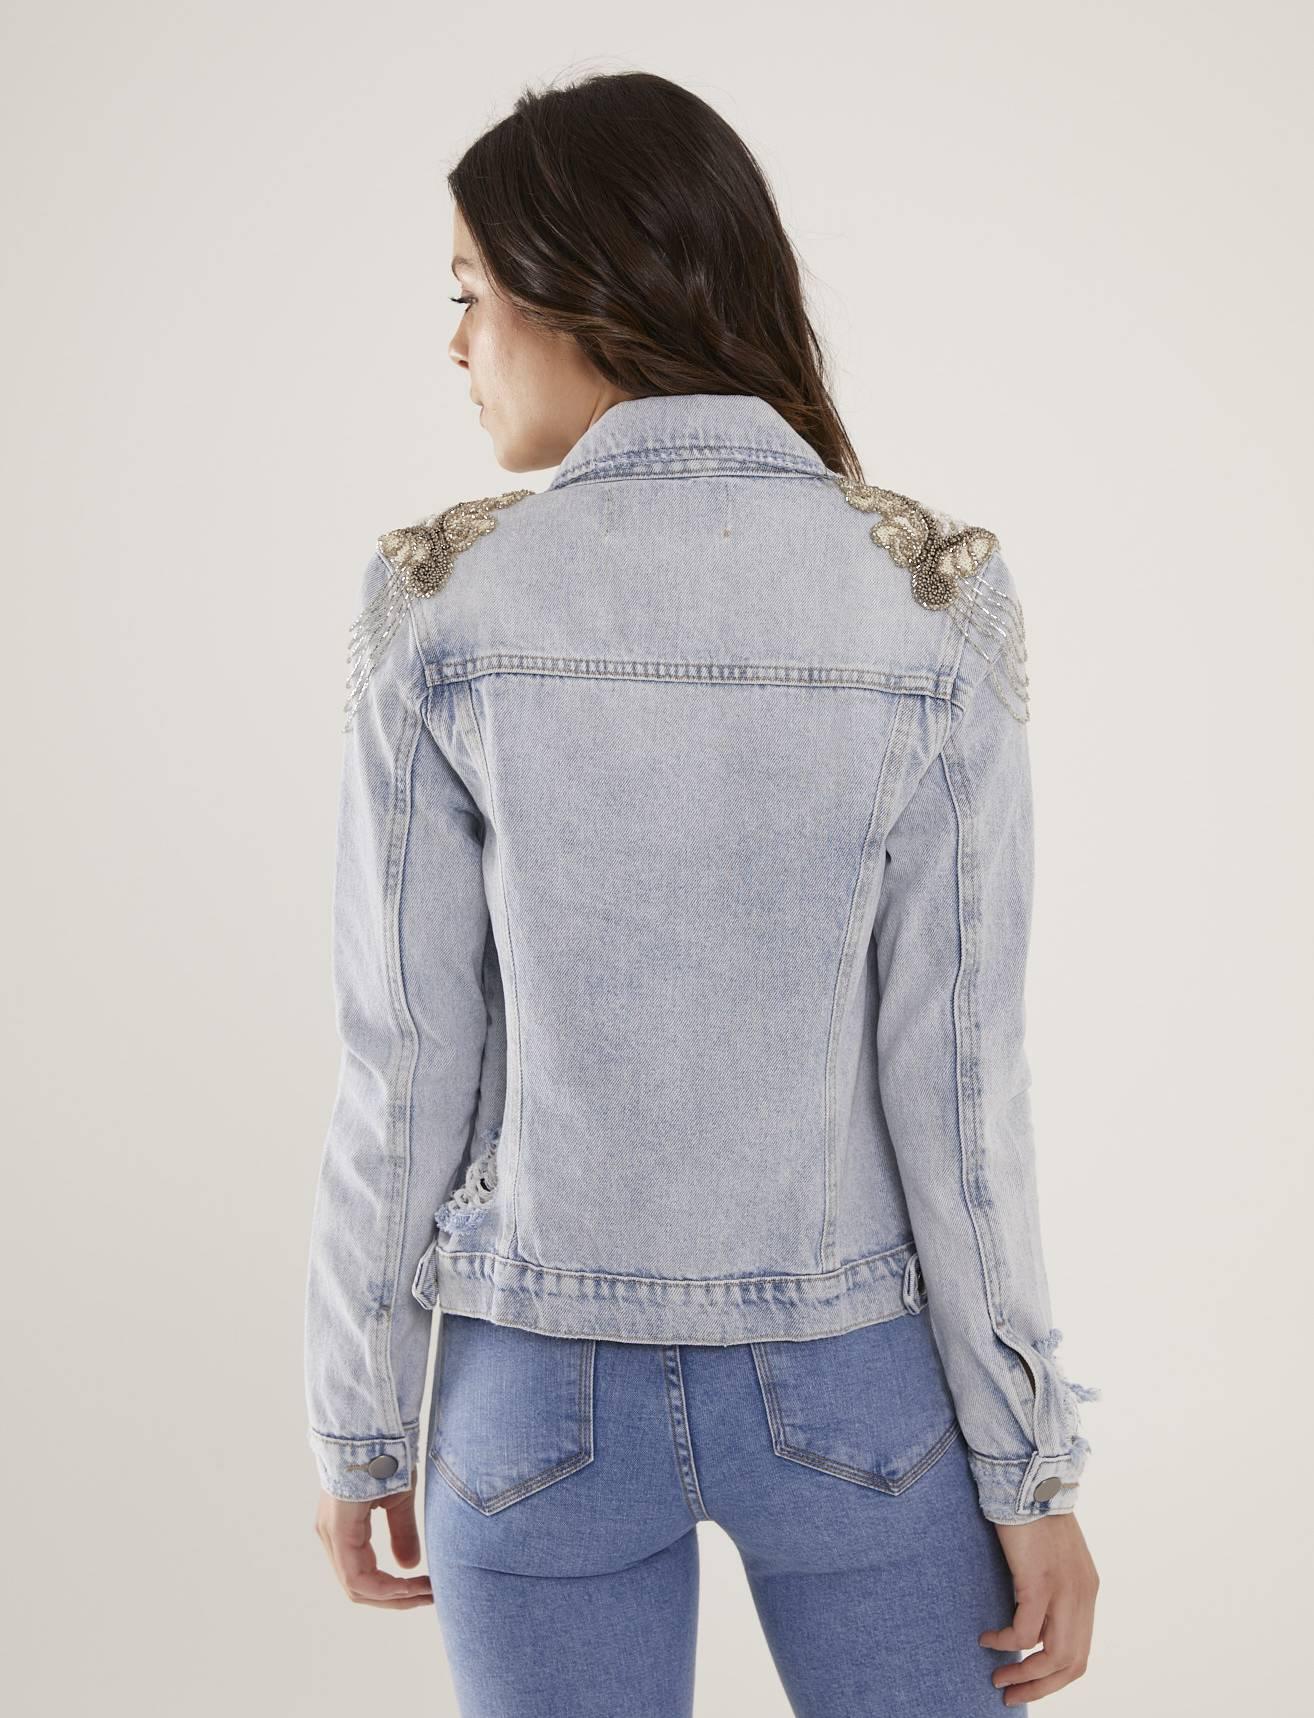 Jaqueta Jeans Feminina Bordada Atelier Quartzo Branco